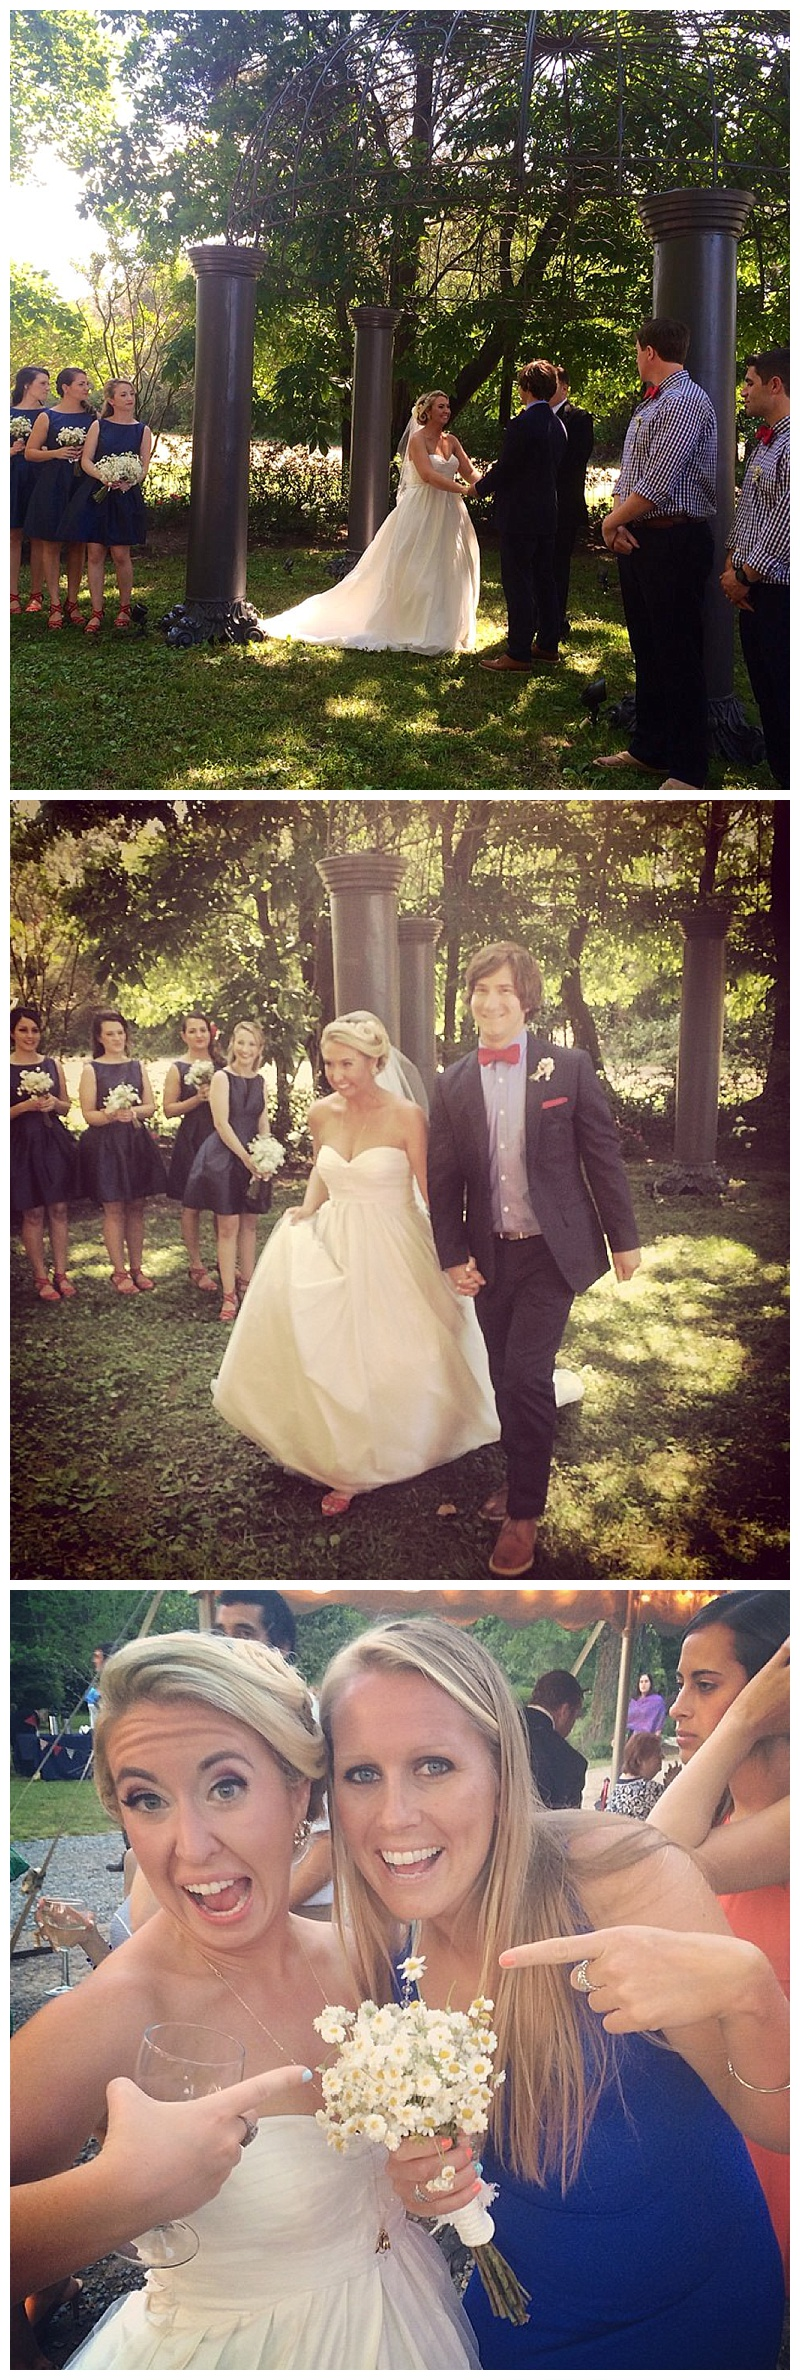 little miss lovely // nautical red white blue wedding // instagram // merry sherwood plantation // berlin, md